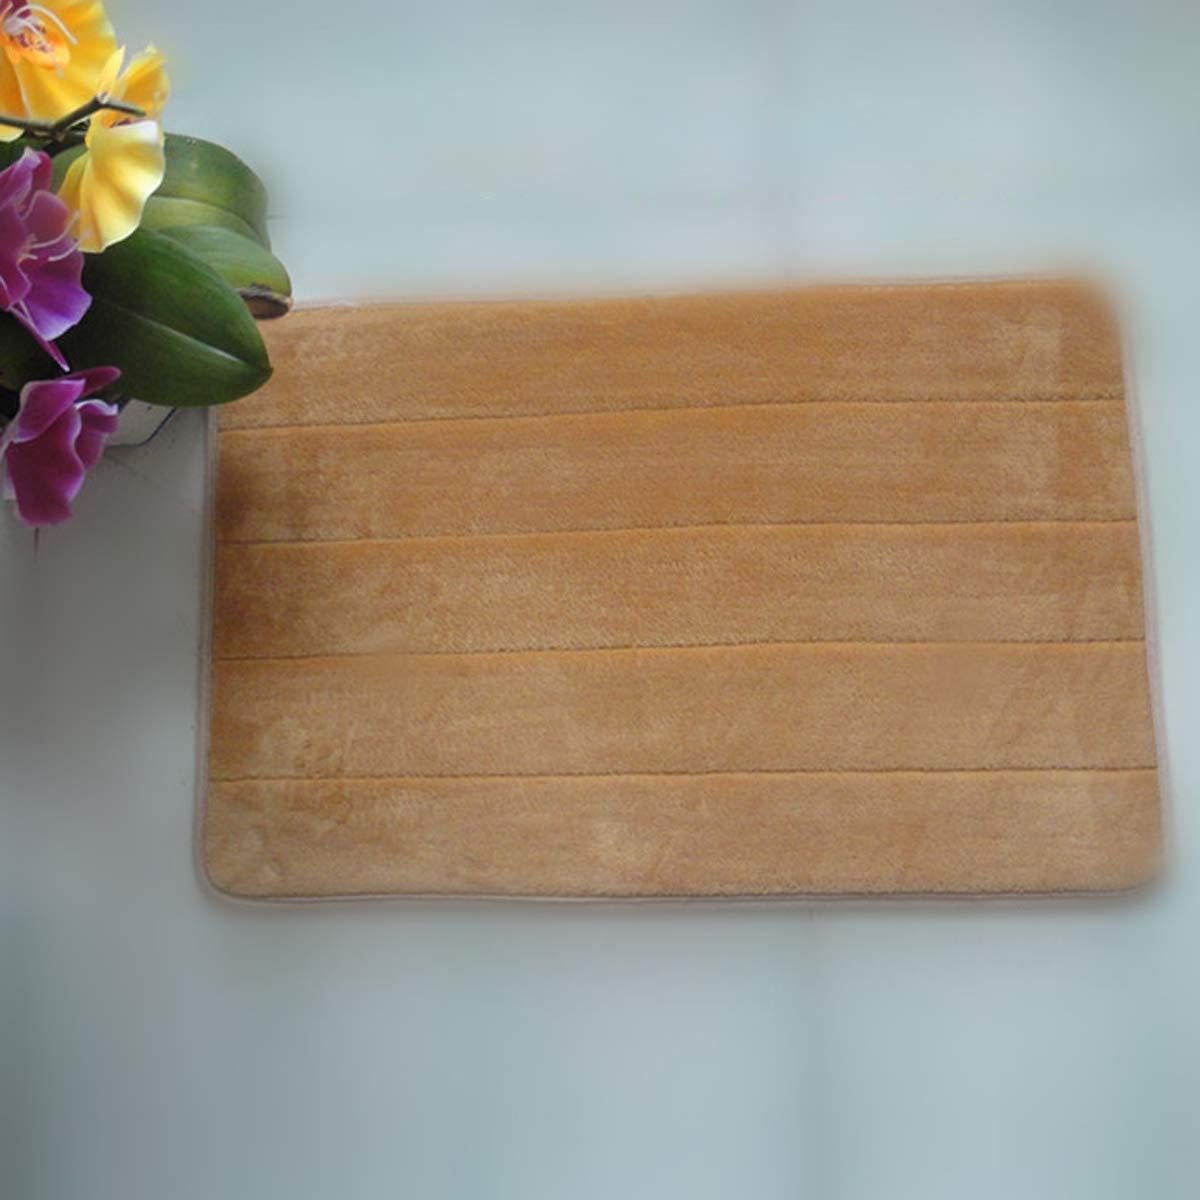 VORCOOL 4060cm Rectangle Shaped Soft Memory Foam Non-Slip Bath Mat Kitchen Mat Floor Rug Mat Carpet (Khaki)